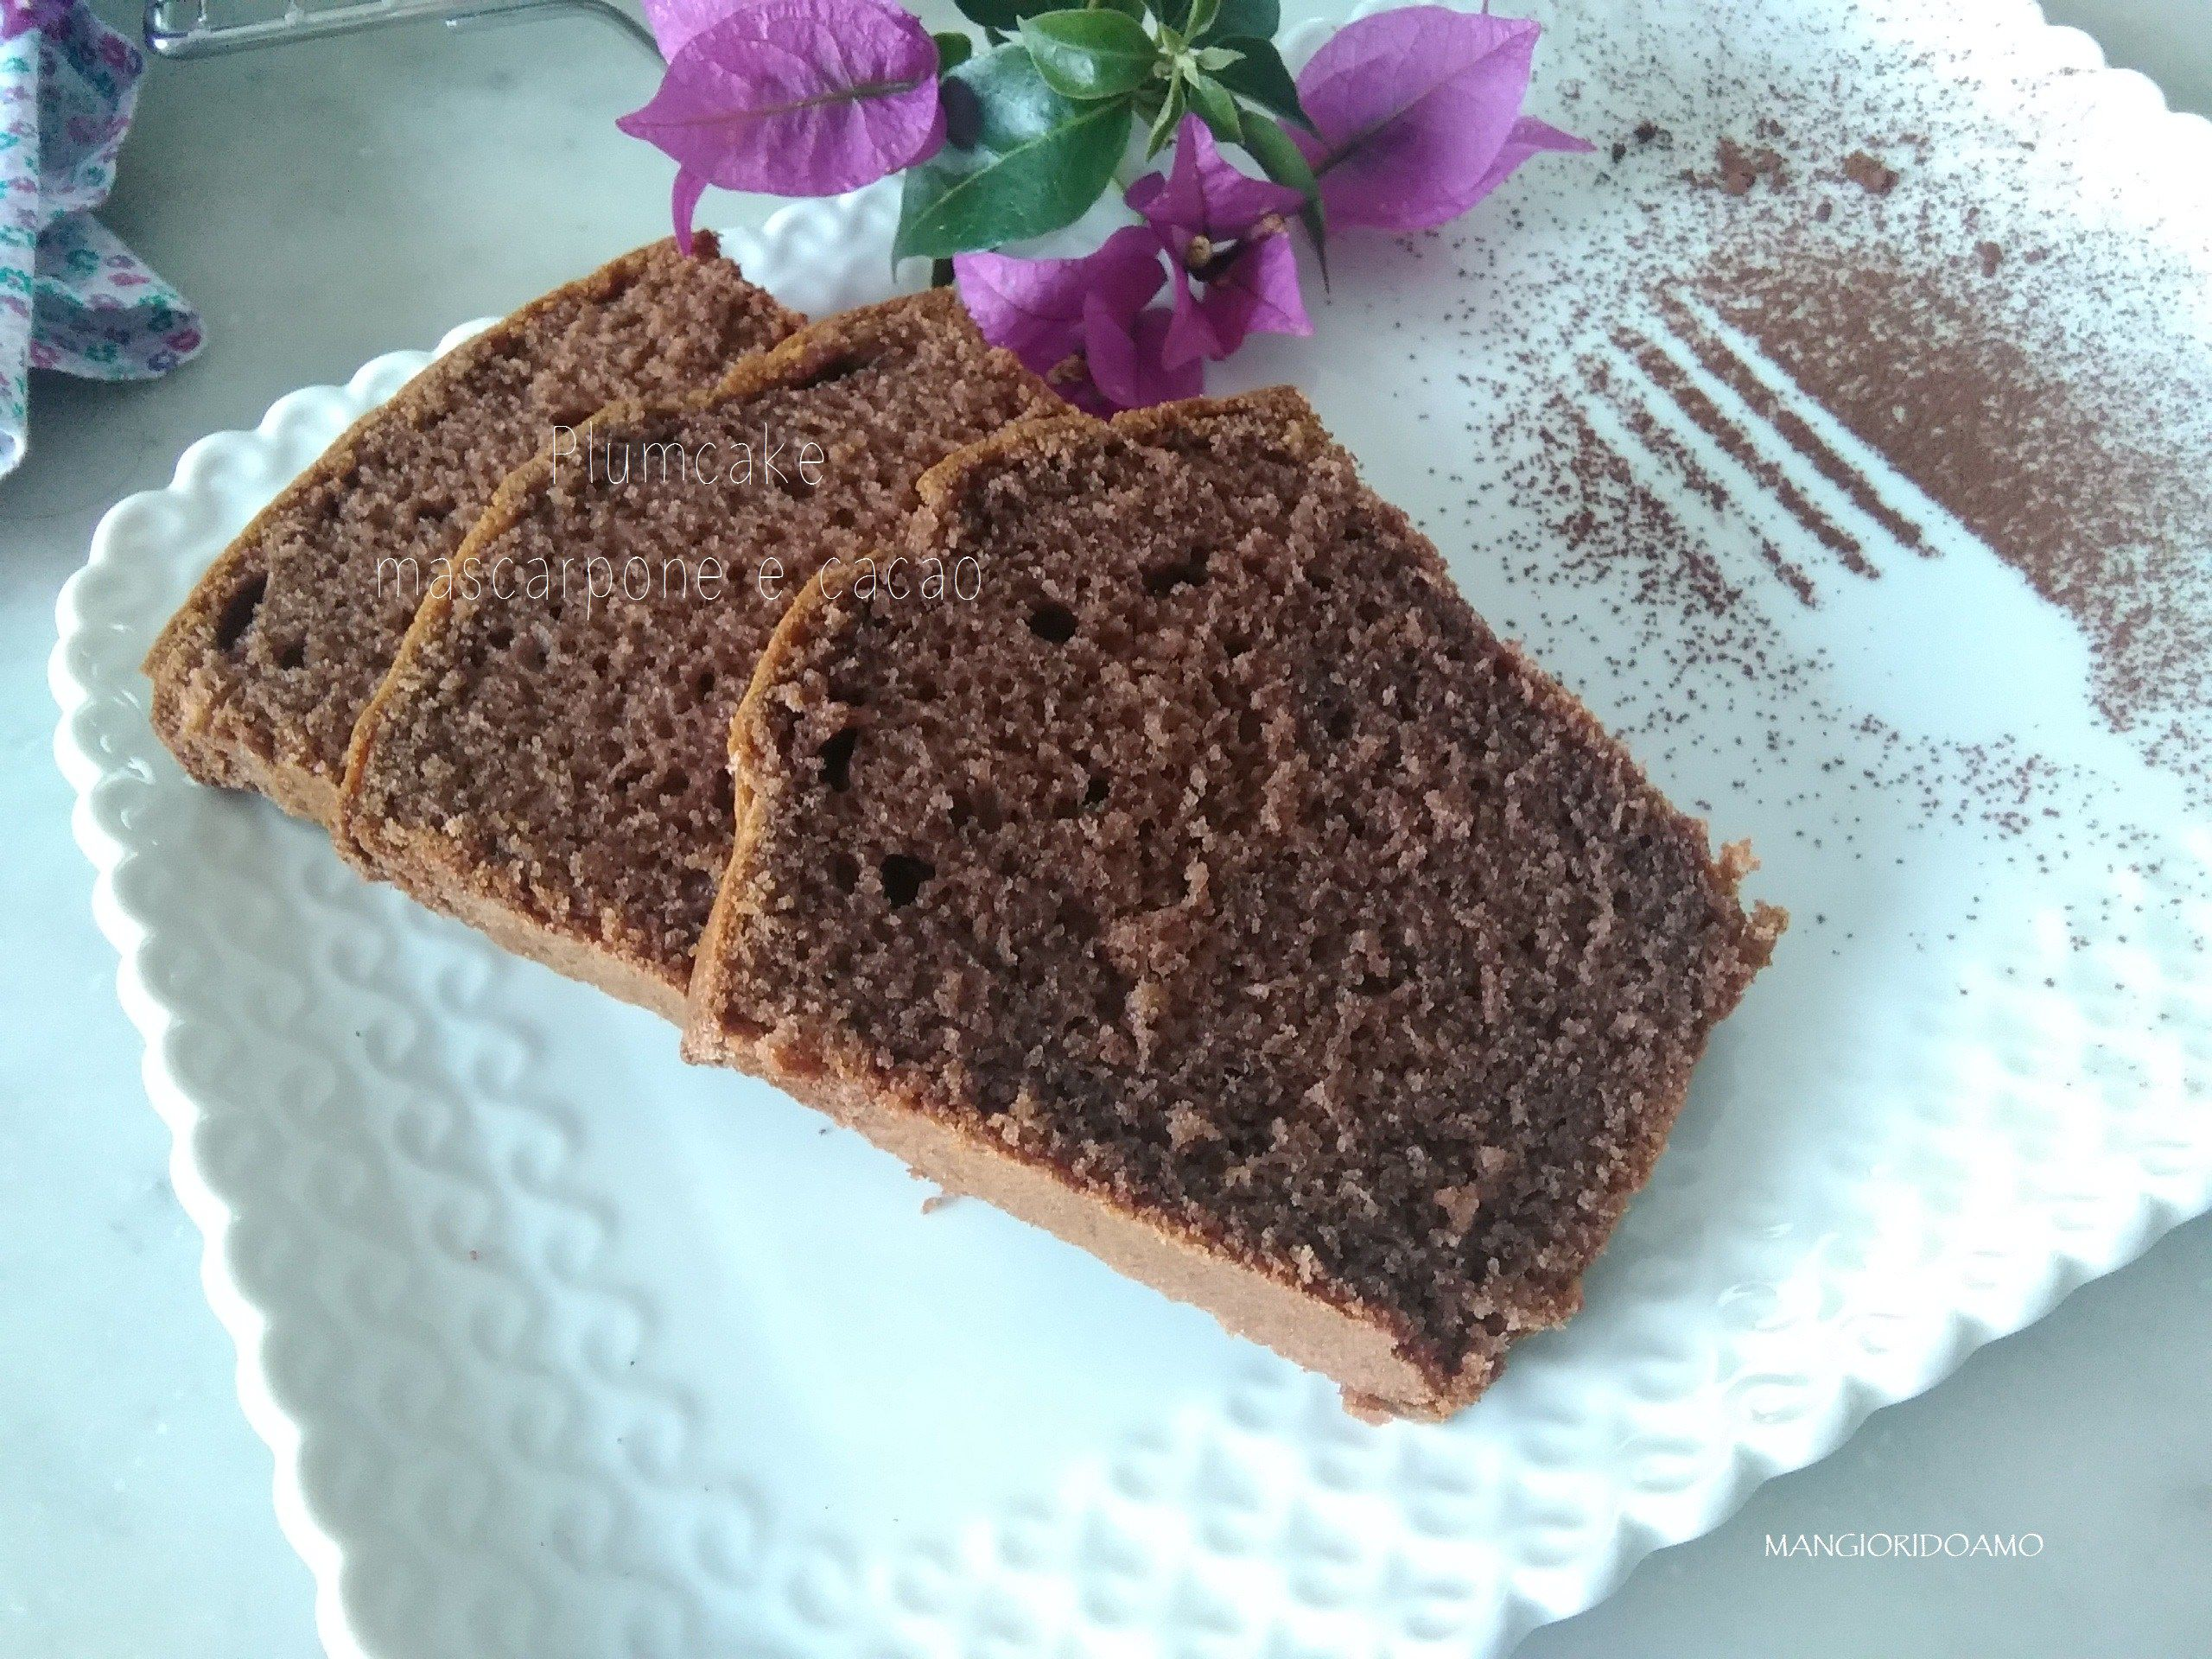 Plumcake mascarpone e cacao http://www.mangioridoamo.com/2016/09/12/plumcake-mascarpone-e-cacao/